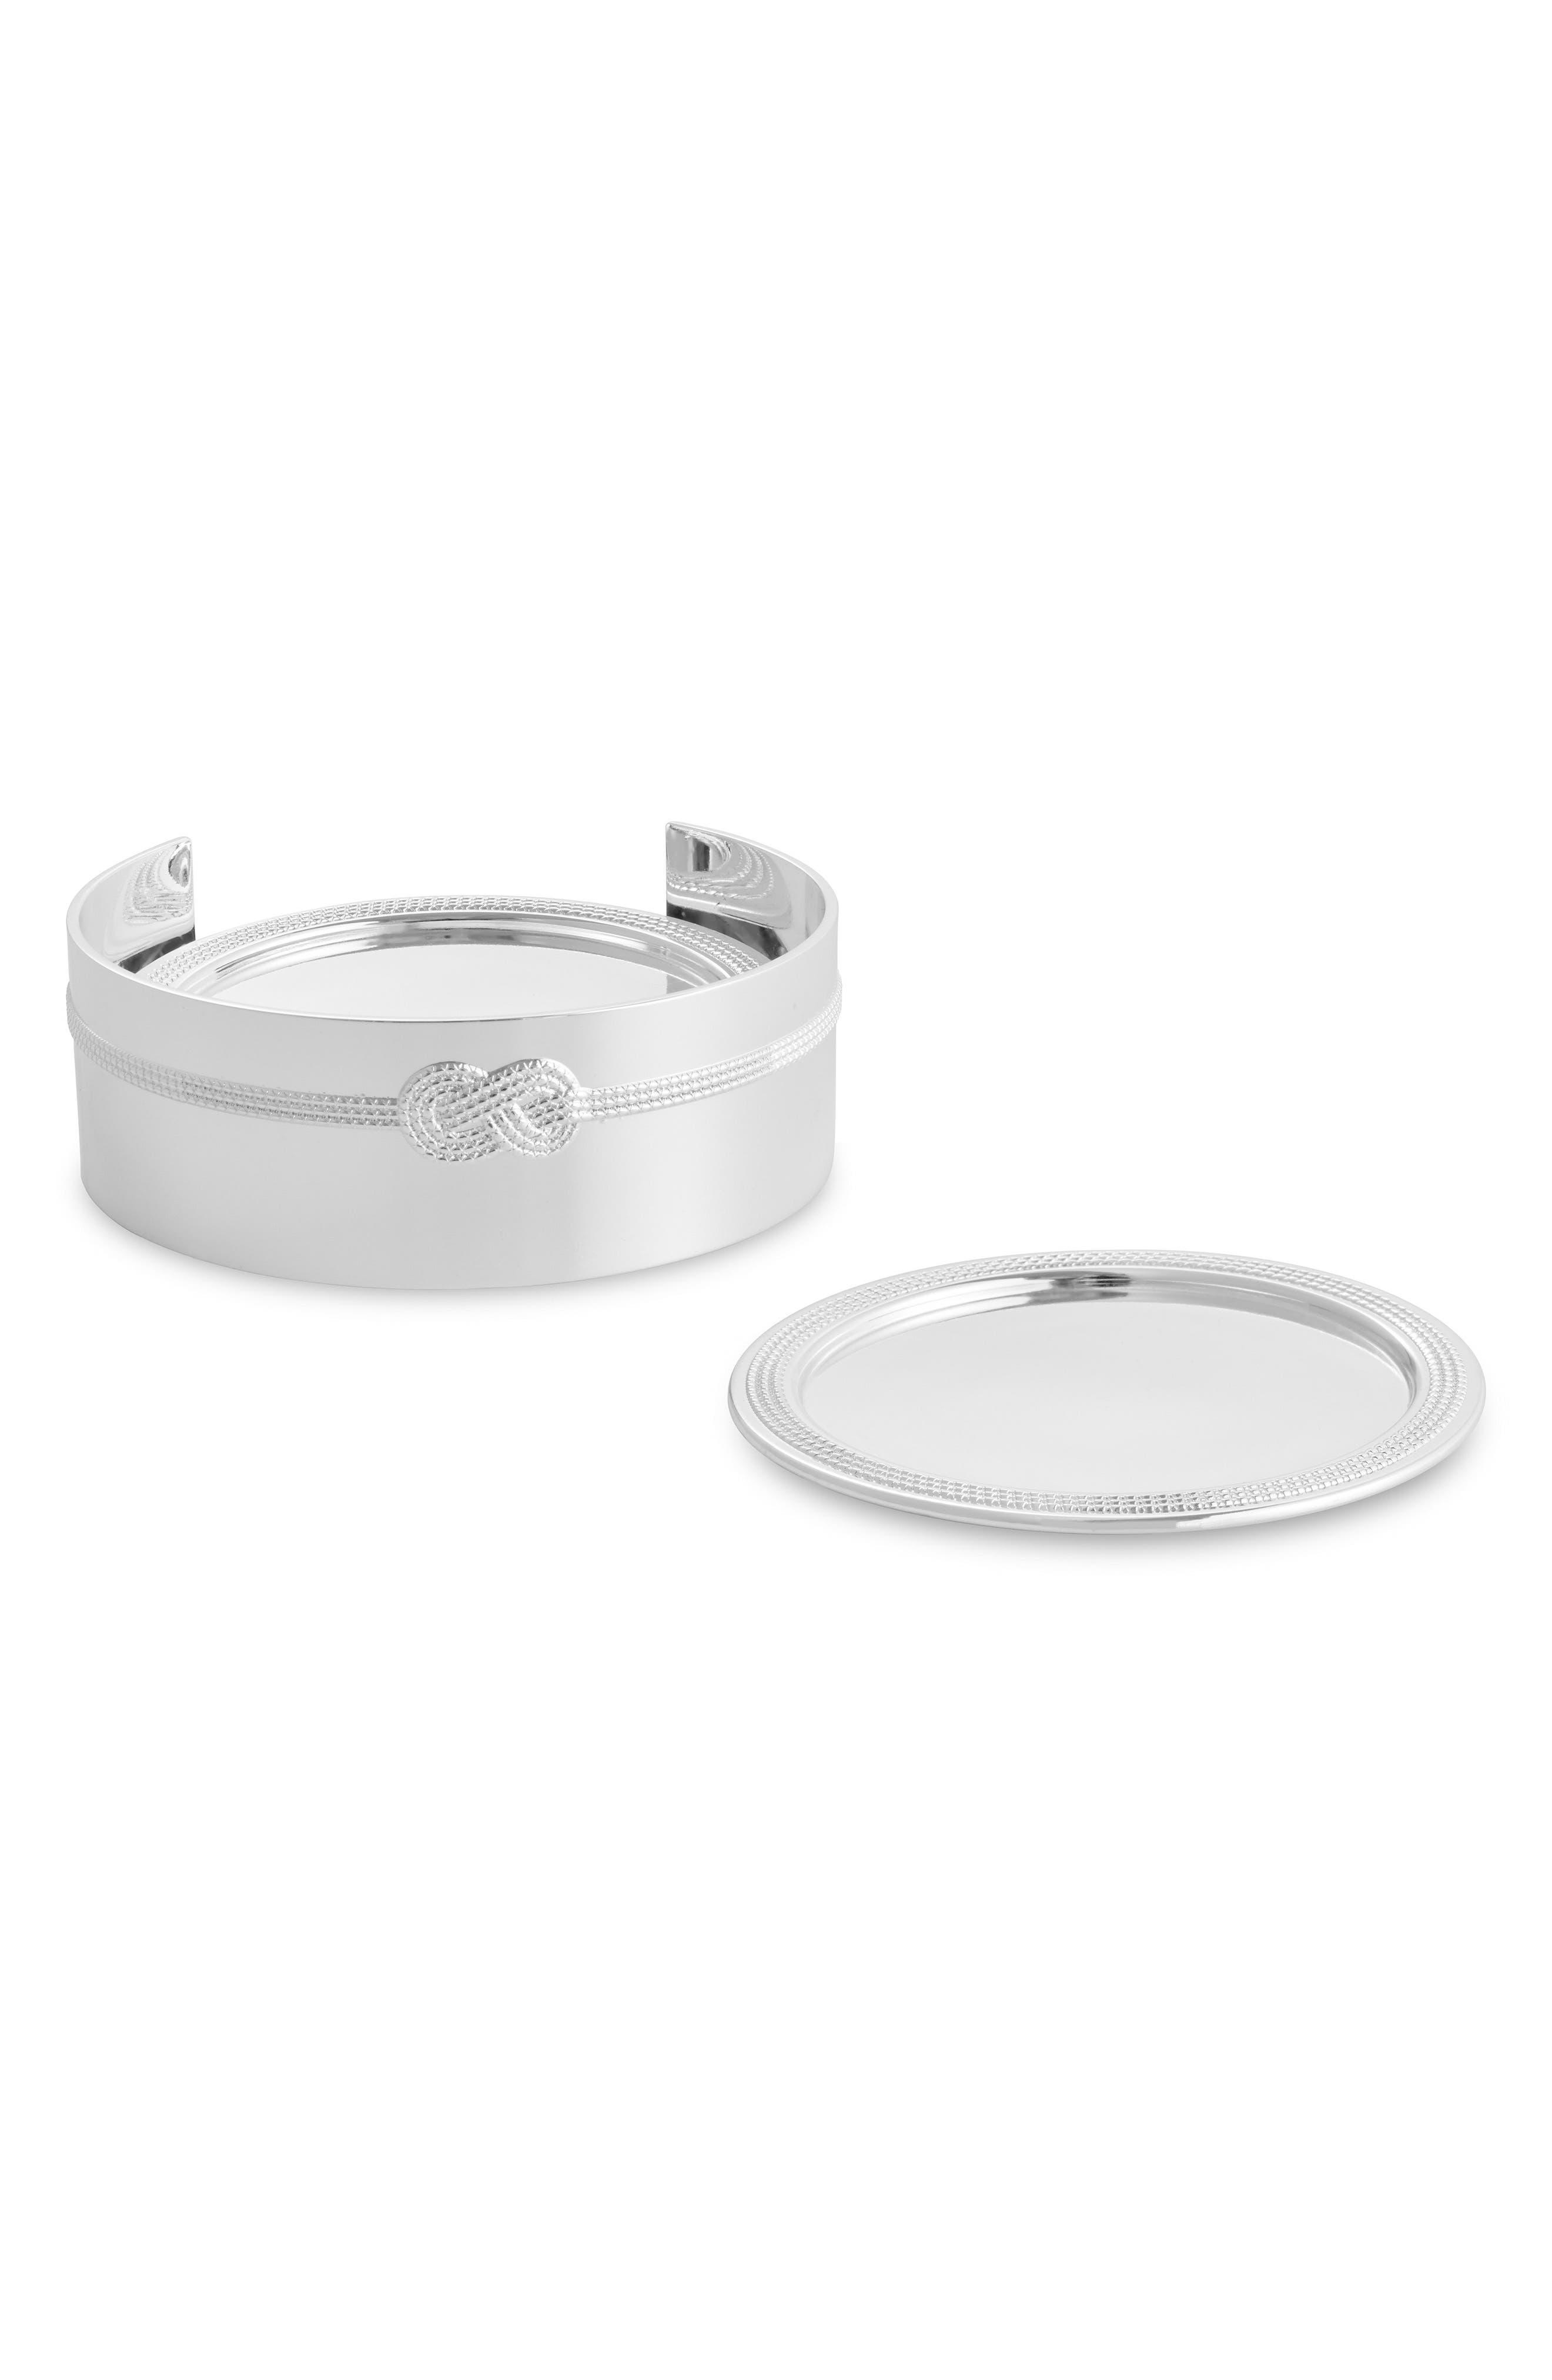 Vera Wang x Wedgwood Infinity Set of 4 Silver Plated Coasters